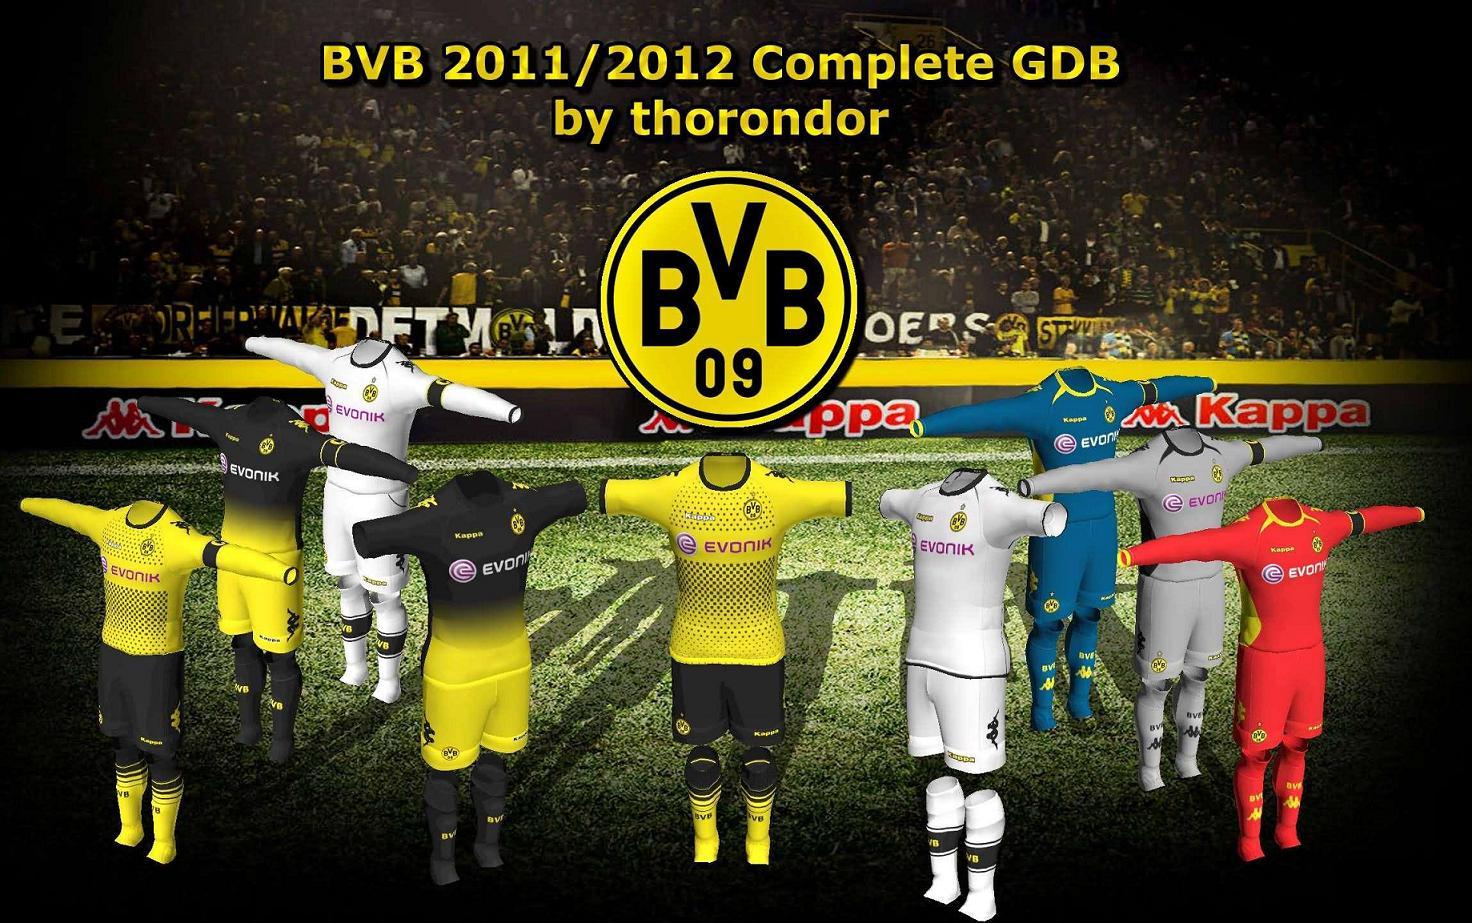 Borussia Dortmund Kits 2011-2012 GDB para PES 2011 by thorondor